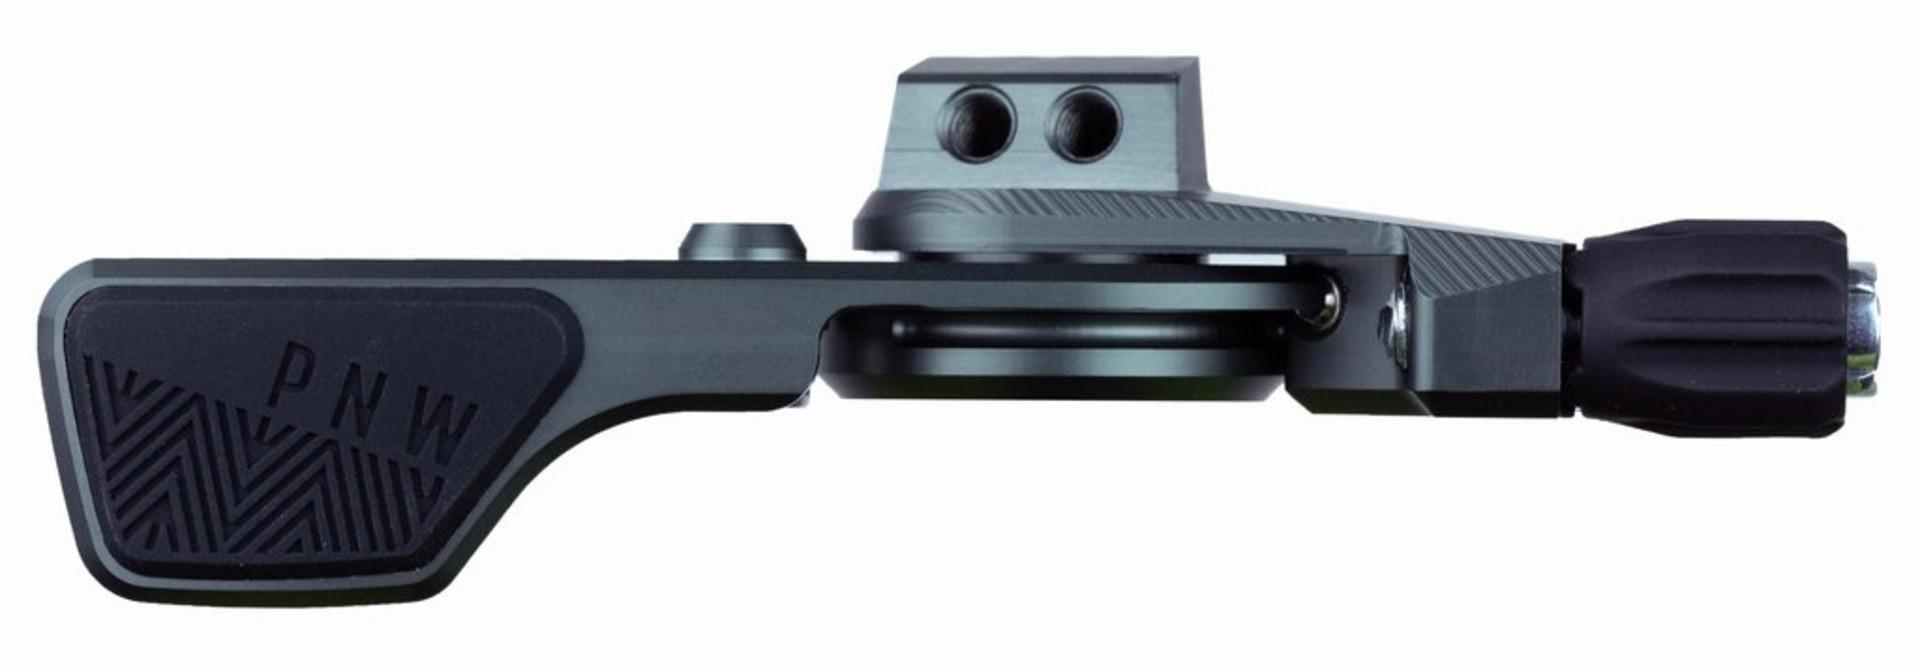 PNW Loam Lever - 022.2 Clamp - Black